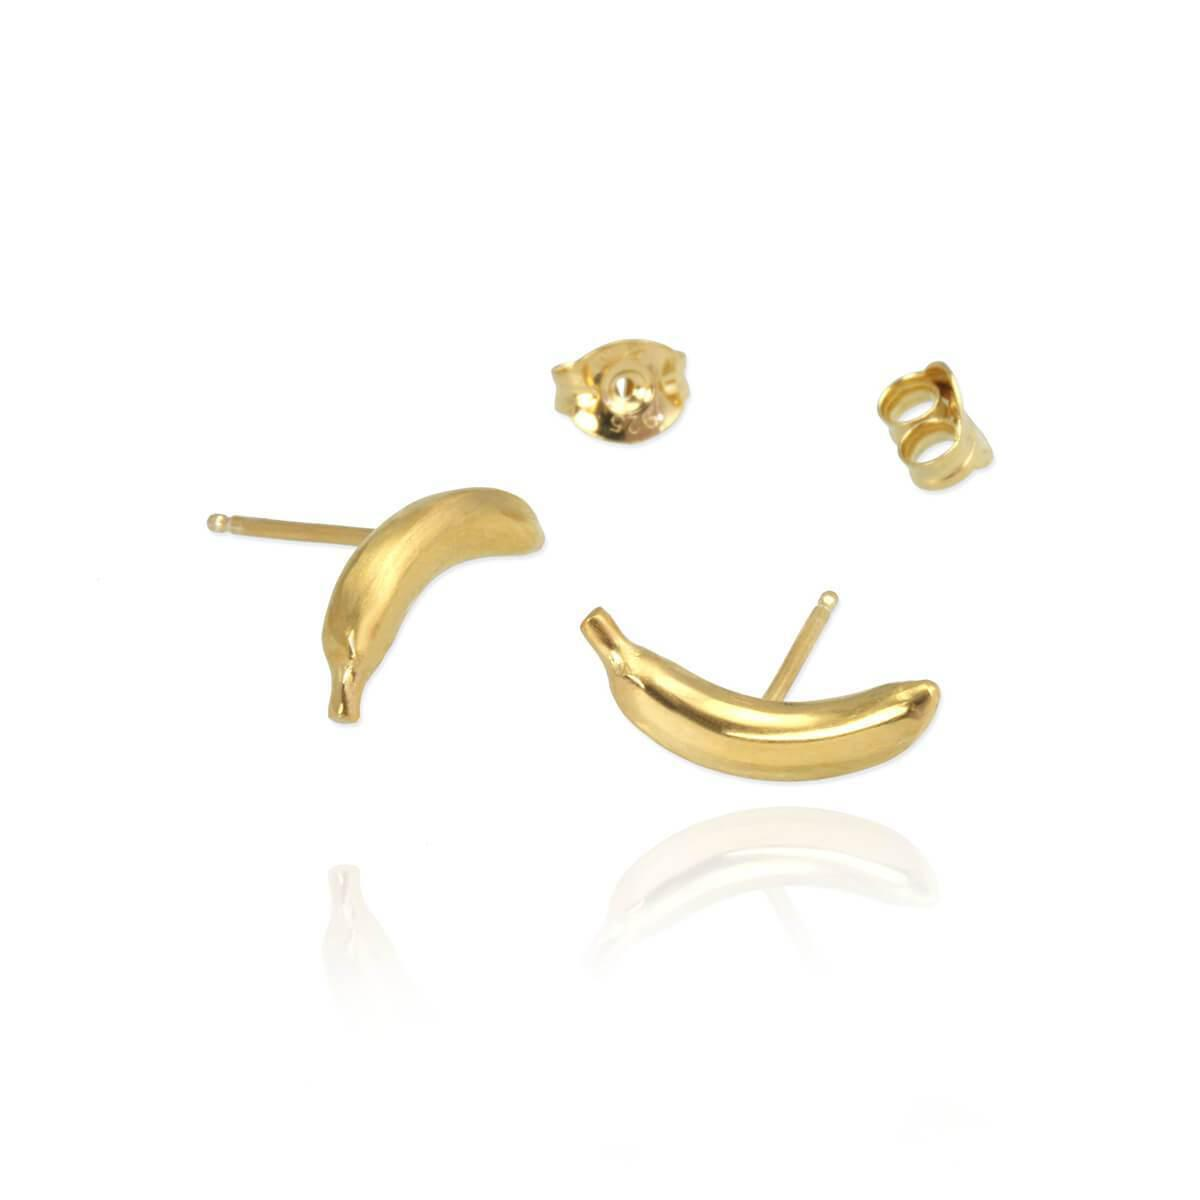 Jana Reinhardt Yellow Gold Plated Banana Stud Earrings UEABt